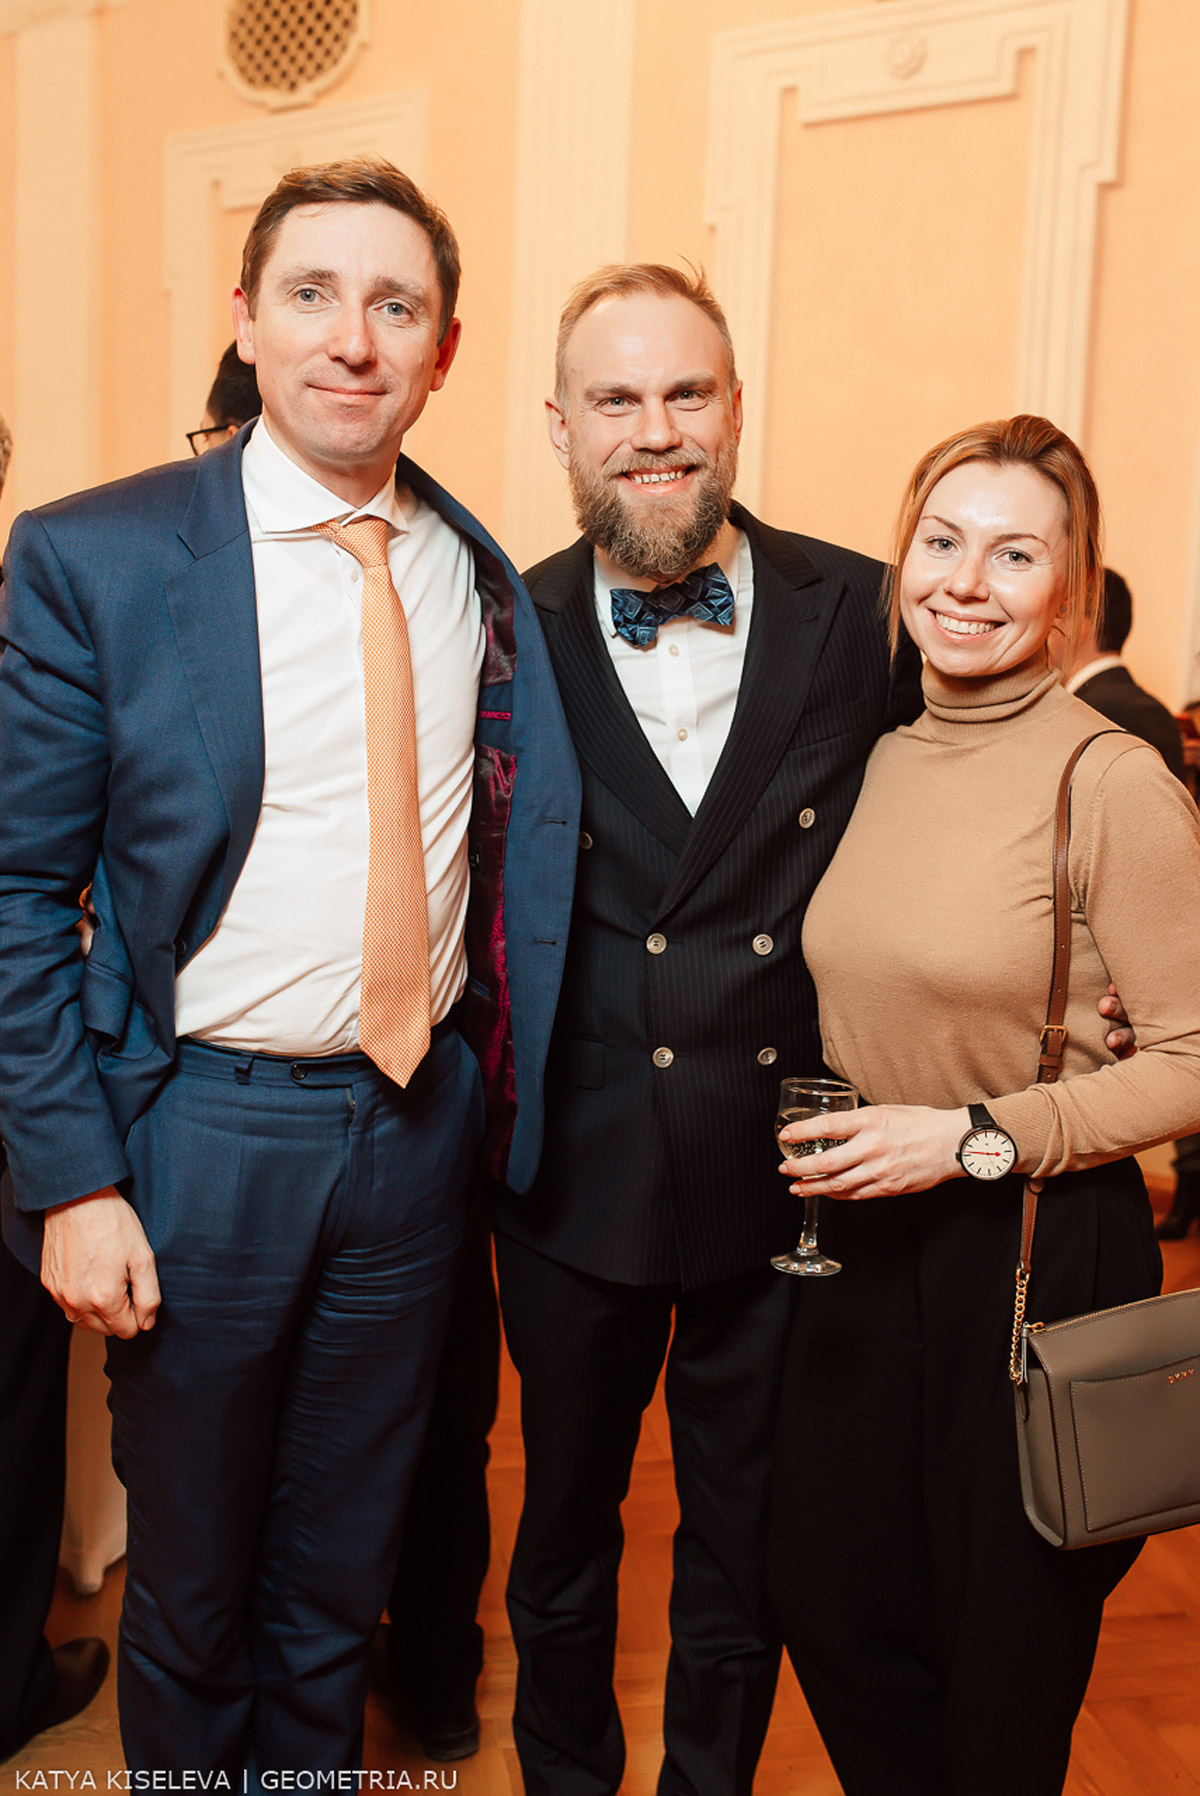 114_2018-02-14_19-10-13_Kiseleva.jpg